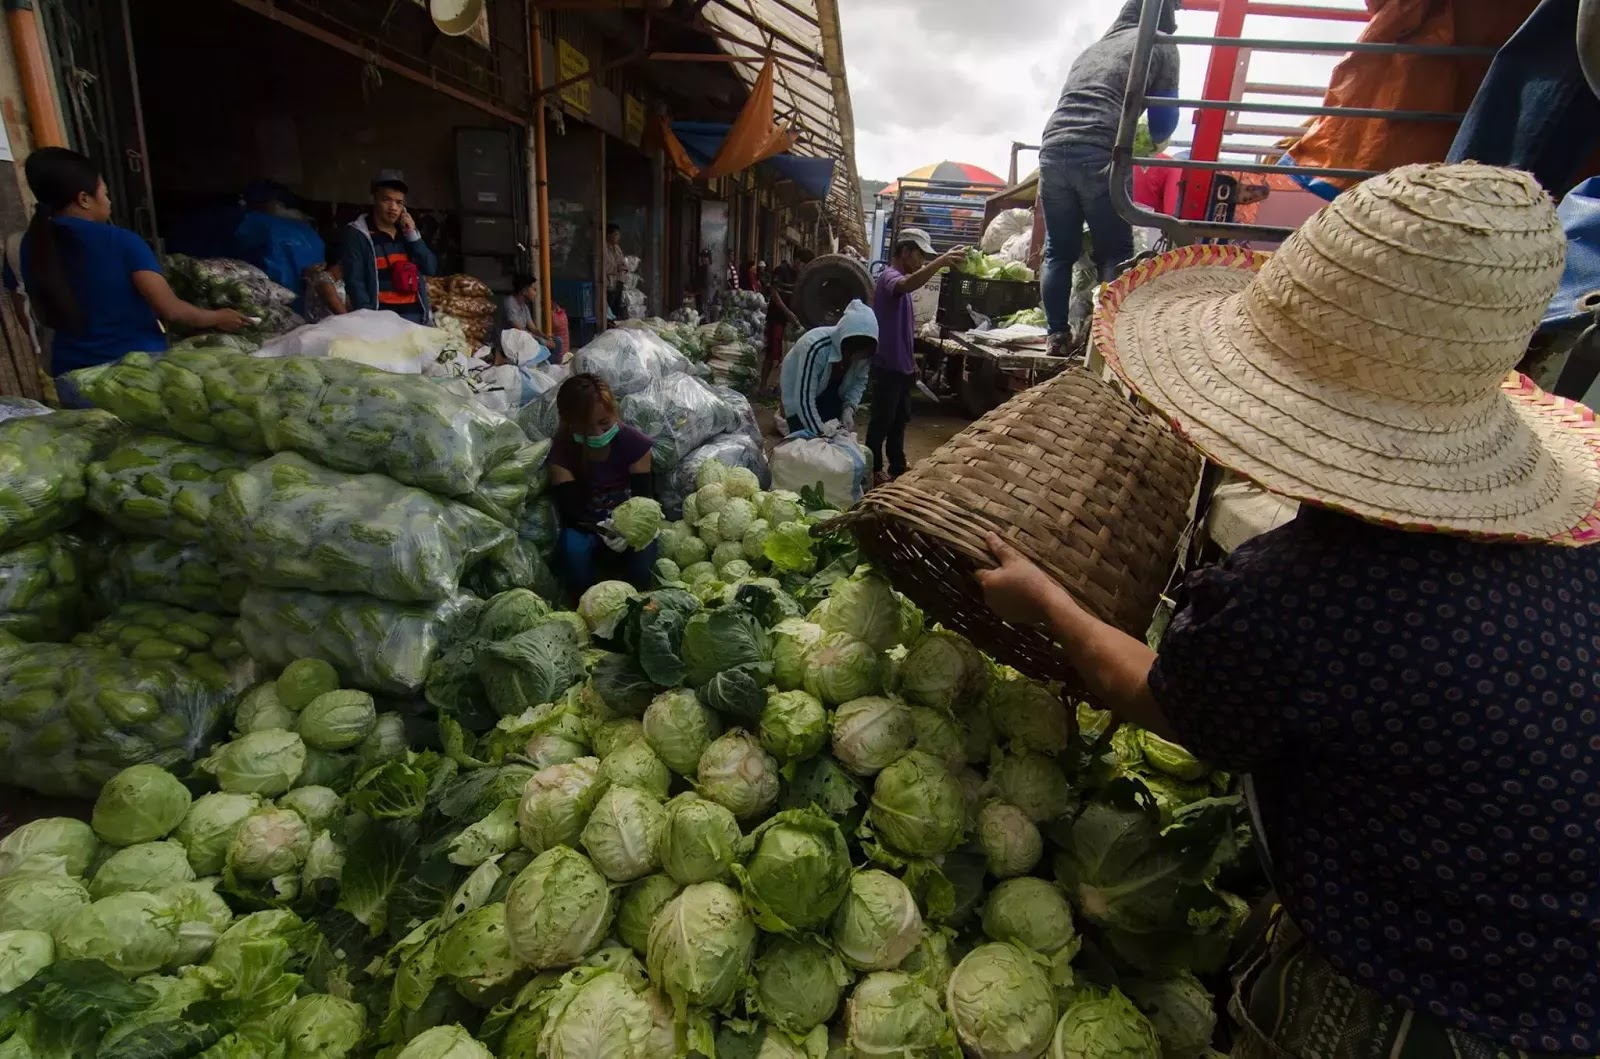 Cabbage Lettuce Chayote Depot Trading Post La Trinidad Benguet Cordillera Administrative Region Philippines